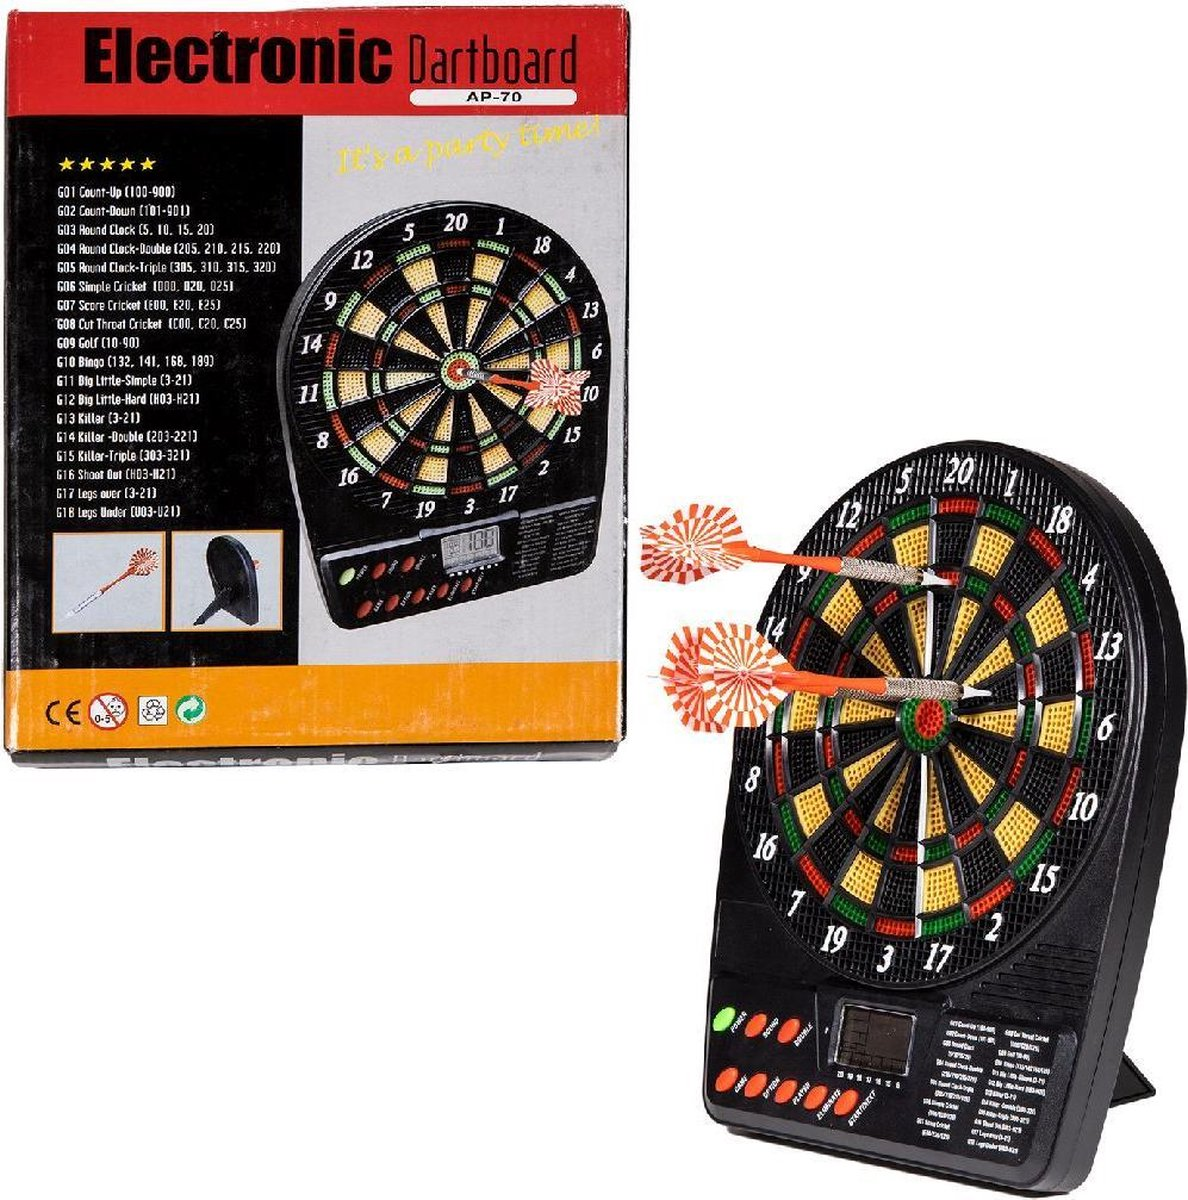 Mini Electronisch Dartboard